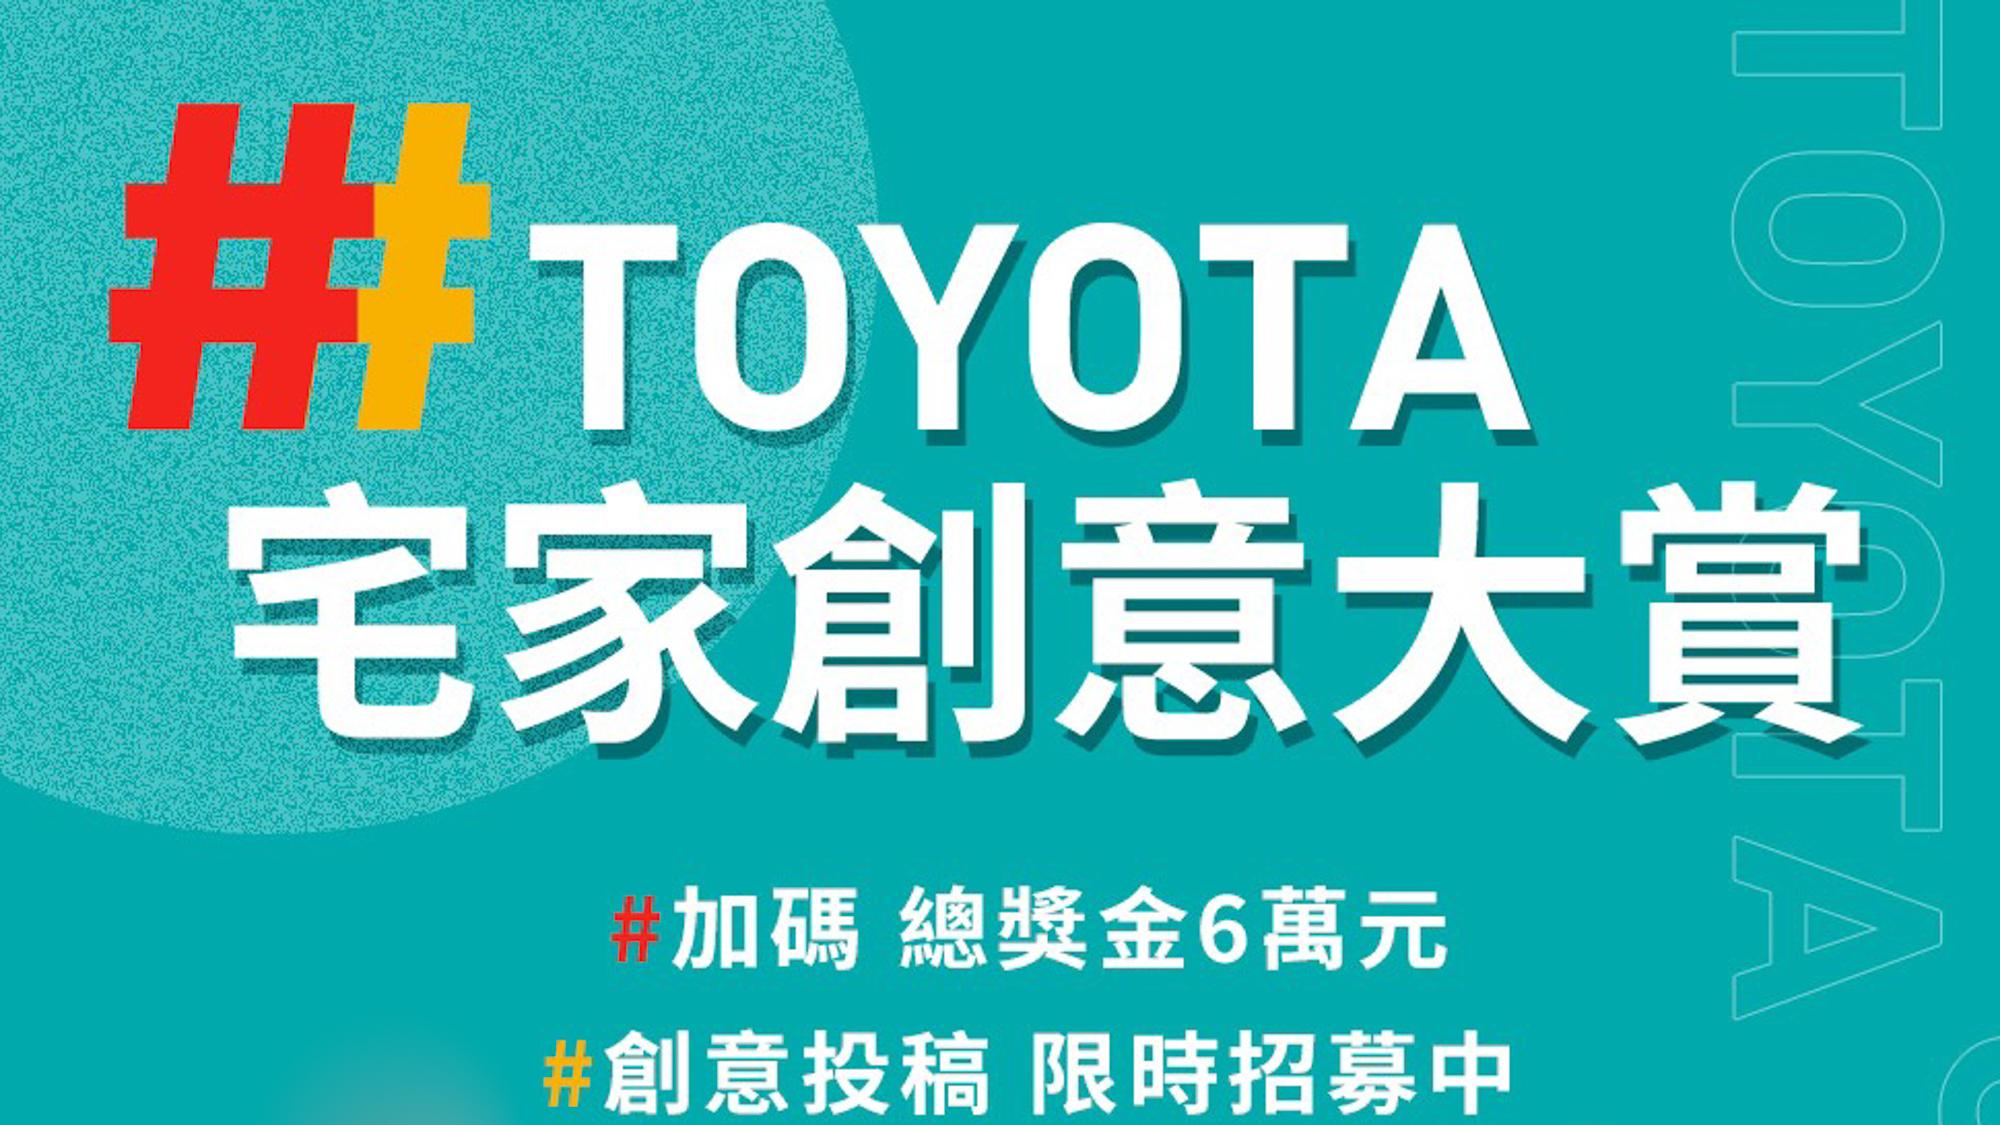 Toyota IG 粉絲數汽車品牌第一!舉辦《宅家創意大賞》加碼總獎金 6 萬元